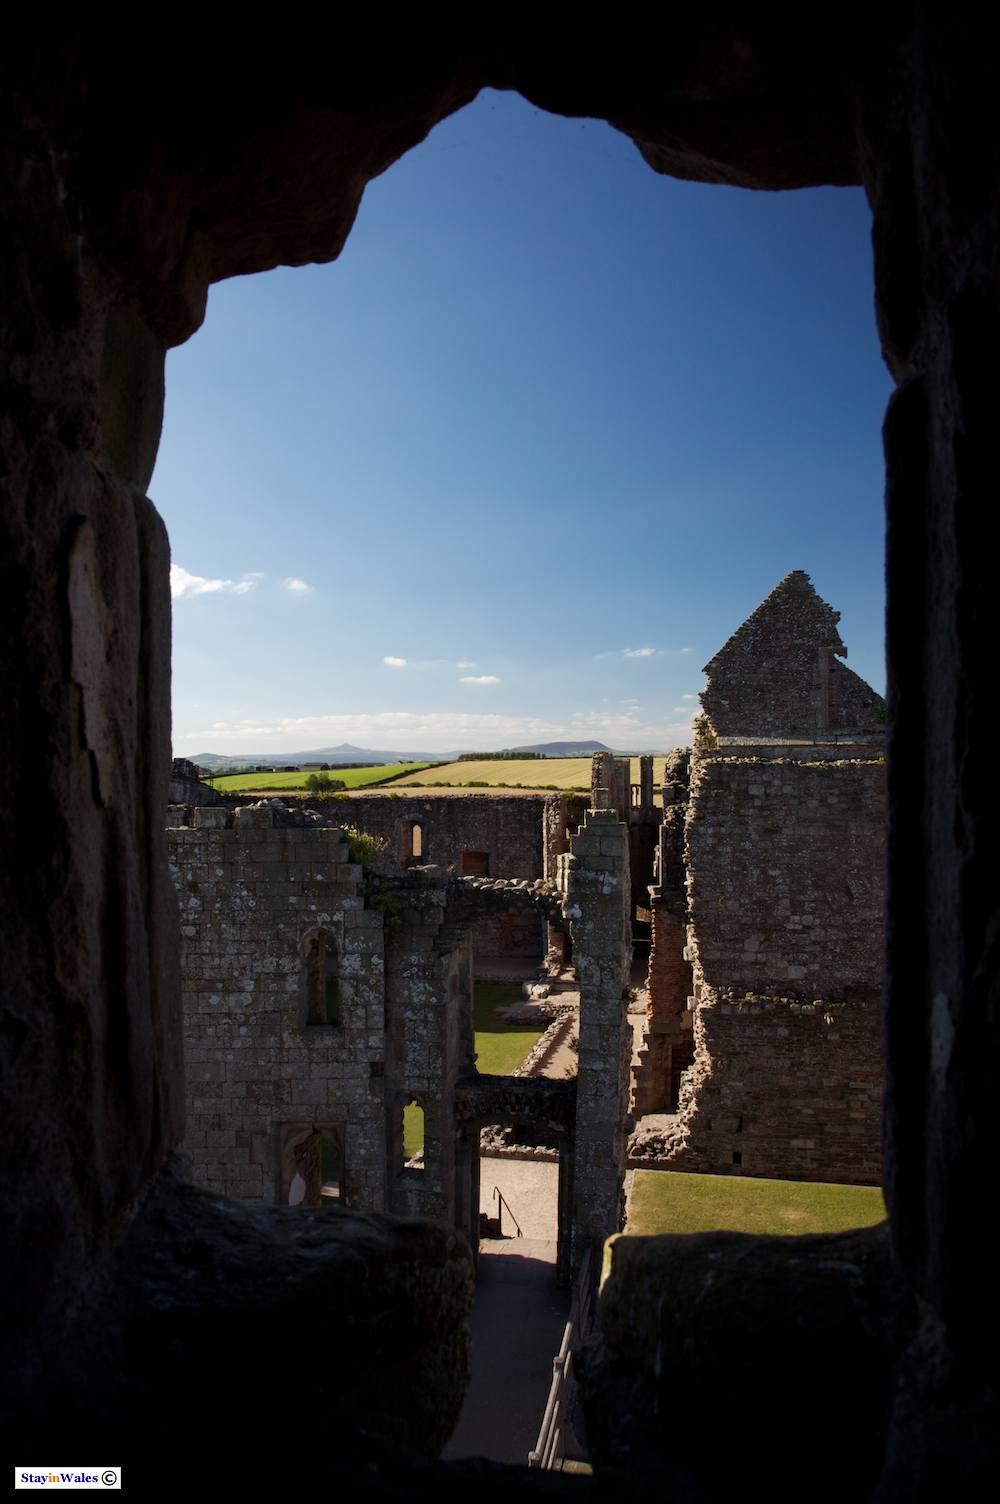 The hall and chapel of Raglan Castle